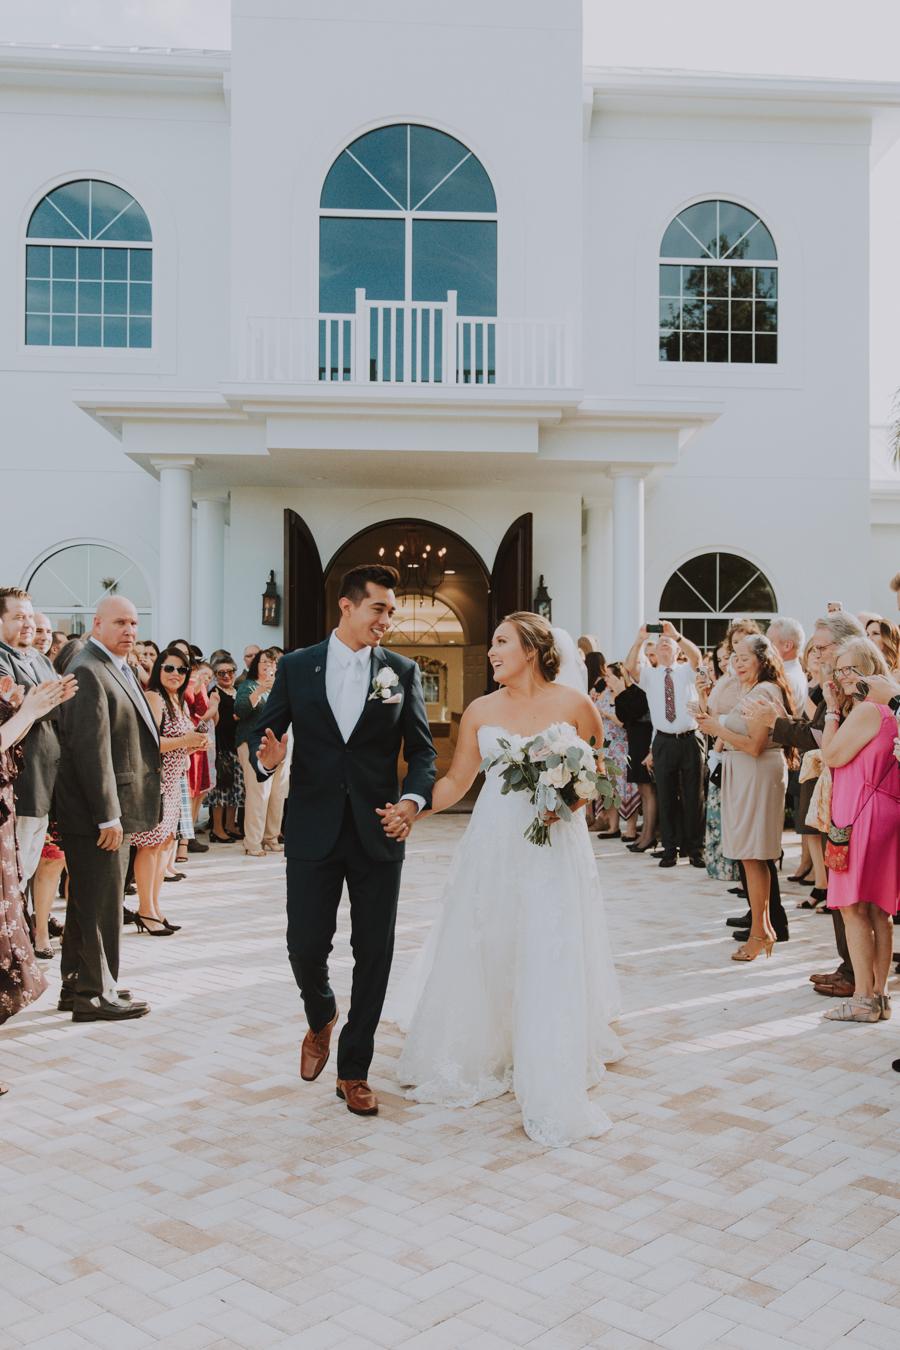 Harborside Chapel Wedding Clearwater Affordable Tampa Venues BHLDN Palm Harbor Safety Harbor Resort and Spa Wedding Malindy Elene Bridal St Pete Wedding Photographer Tampa Wedding Photographer-148.jpg